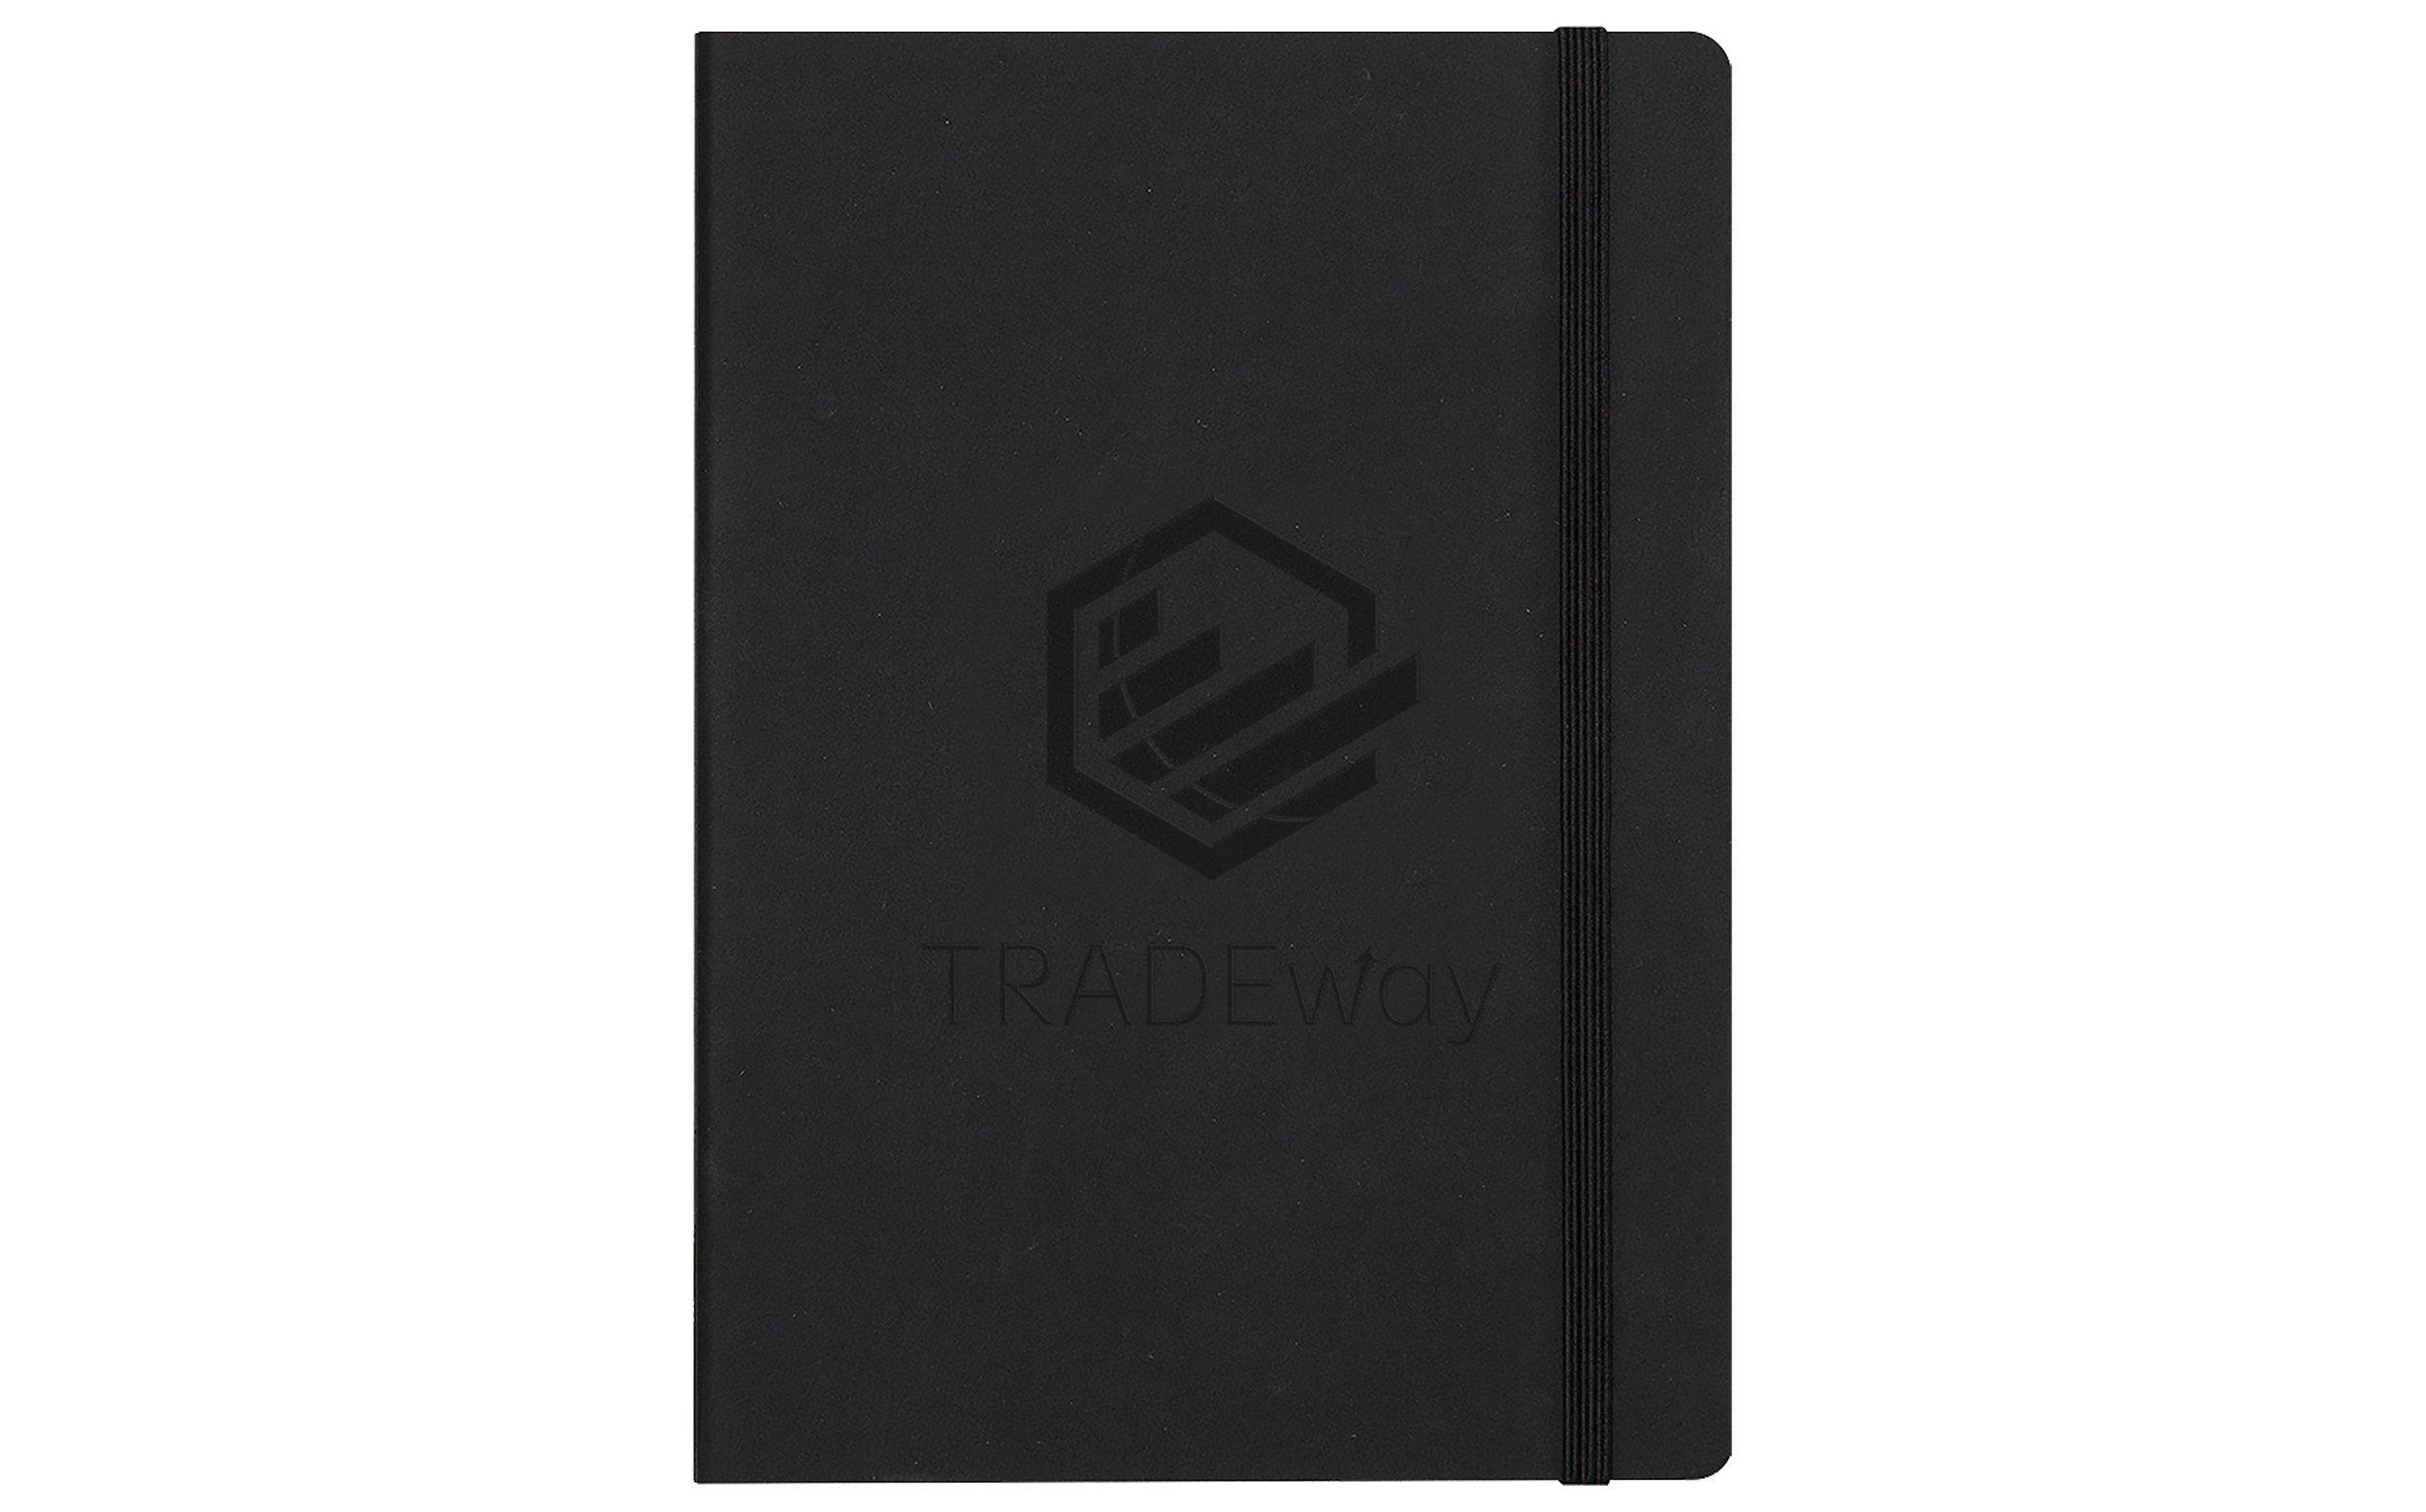 TRADEway Journal   $15